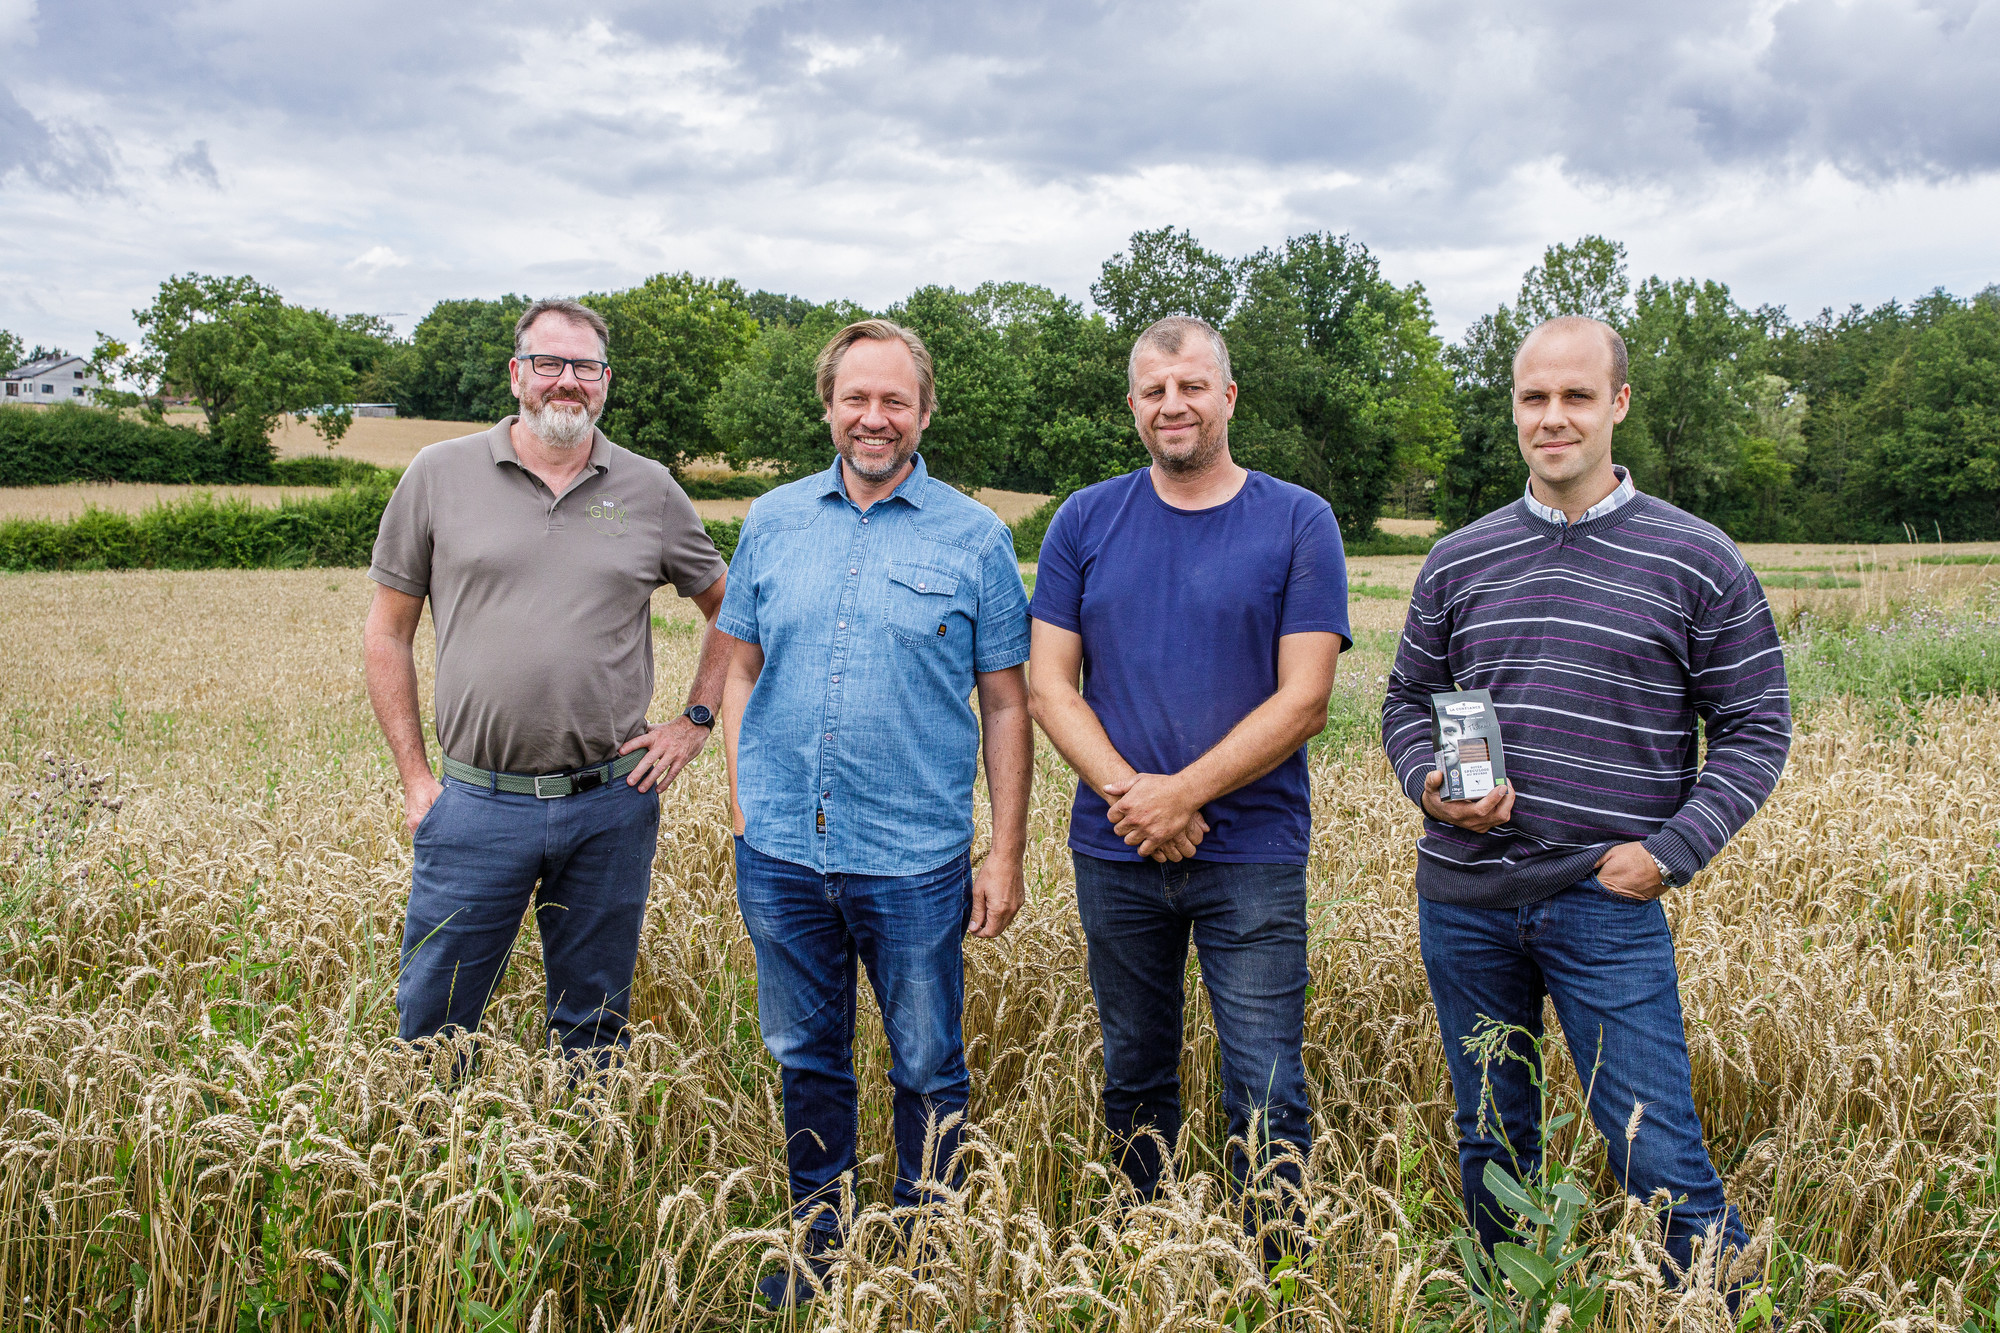 Guy Thorrez, Leo Bormans, Matthias Fayt en Thibault Hannnoteau